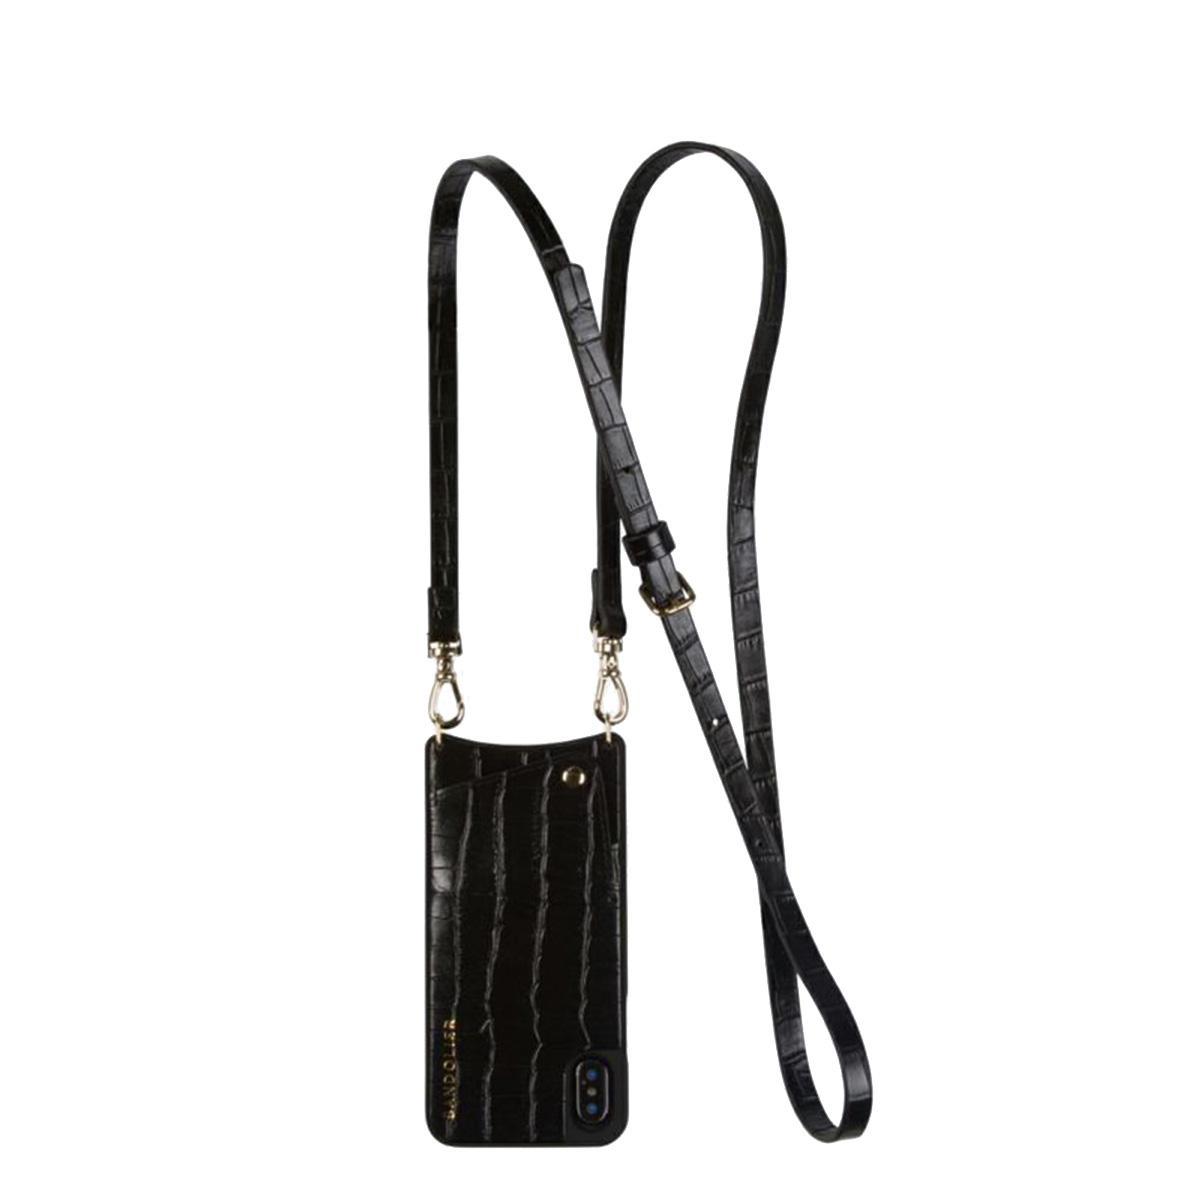 BANDOLIER EMMA CROC BLACK バンドリヤー iPhoneXS X ケース スマホ 携帯 アイフォン レディース ブラック 黒 10emm